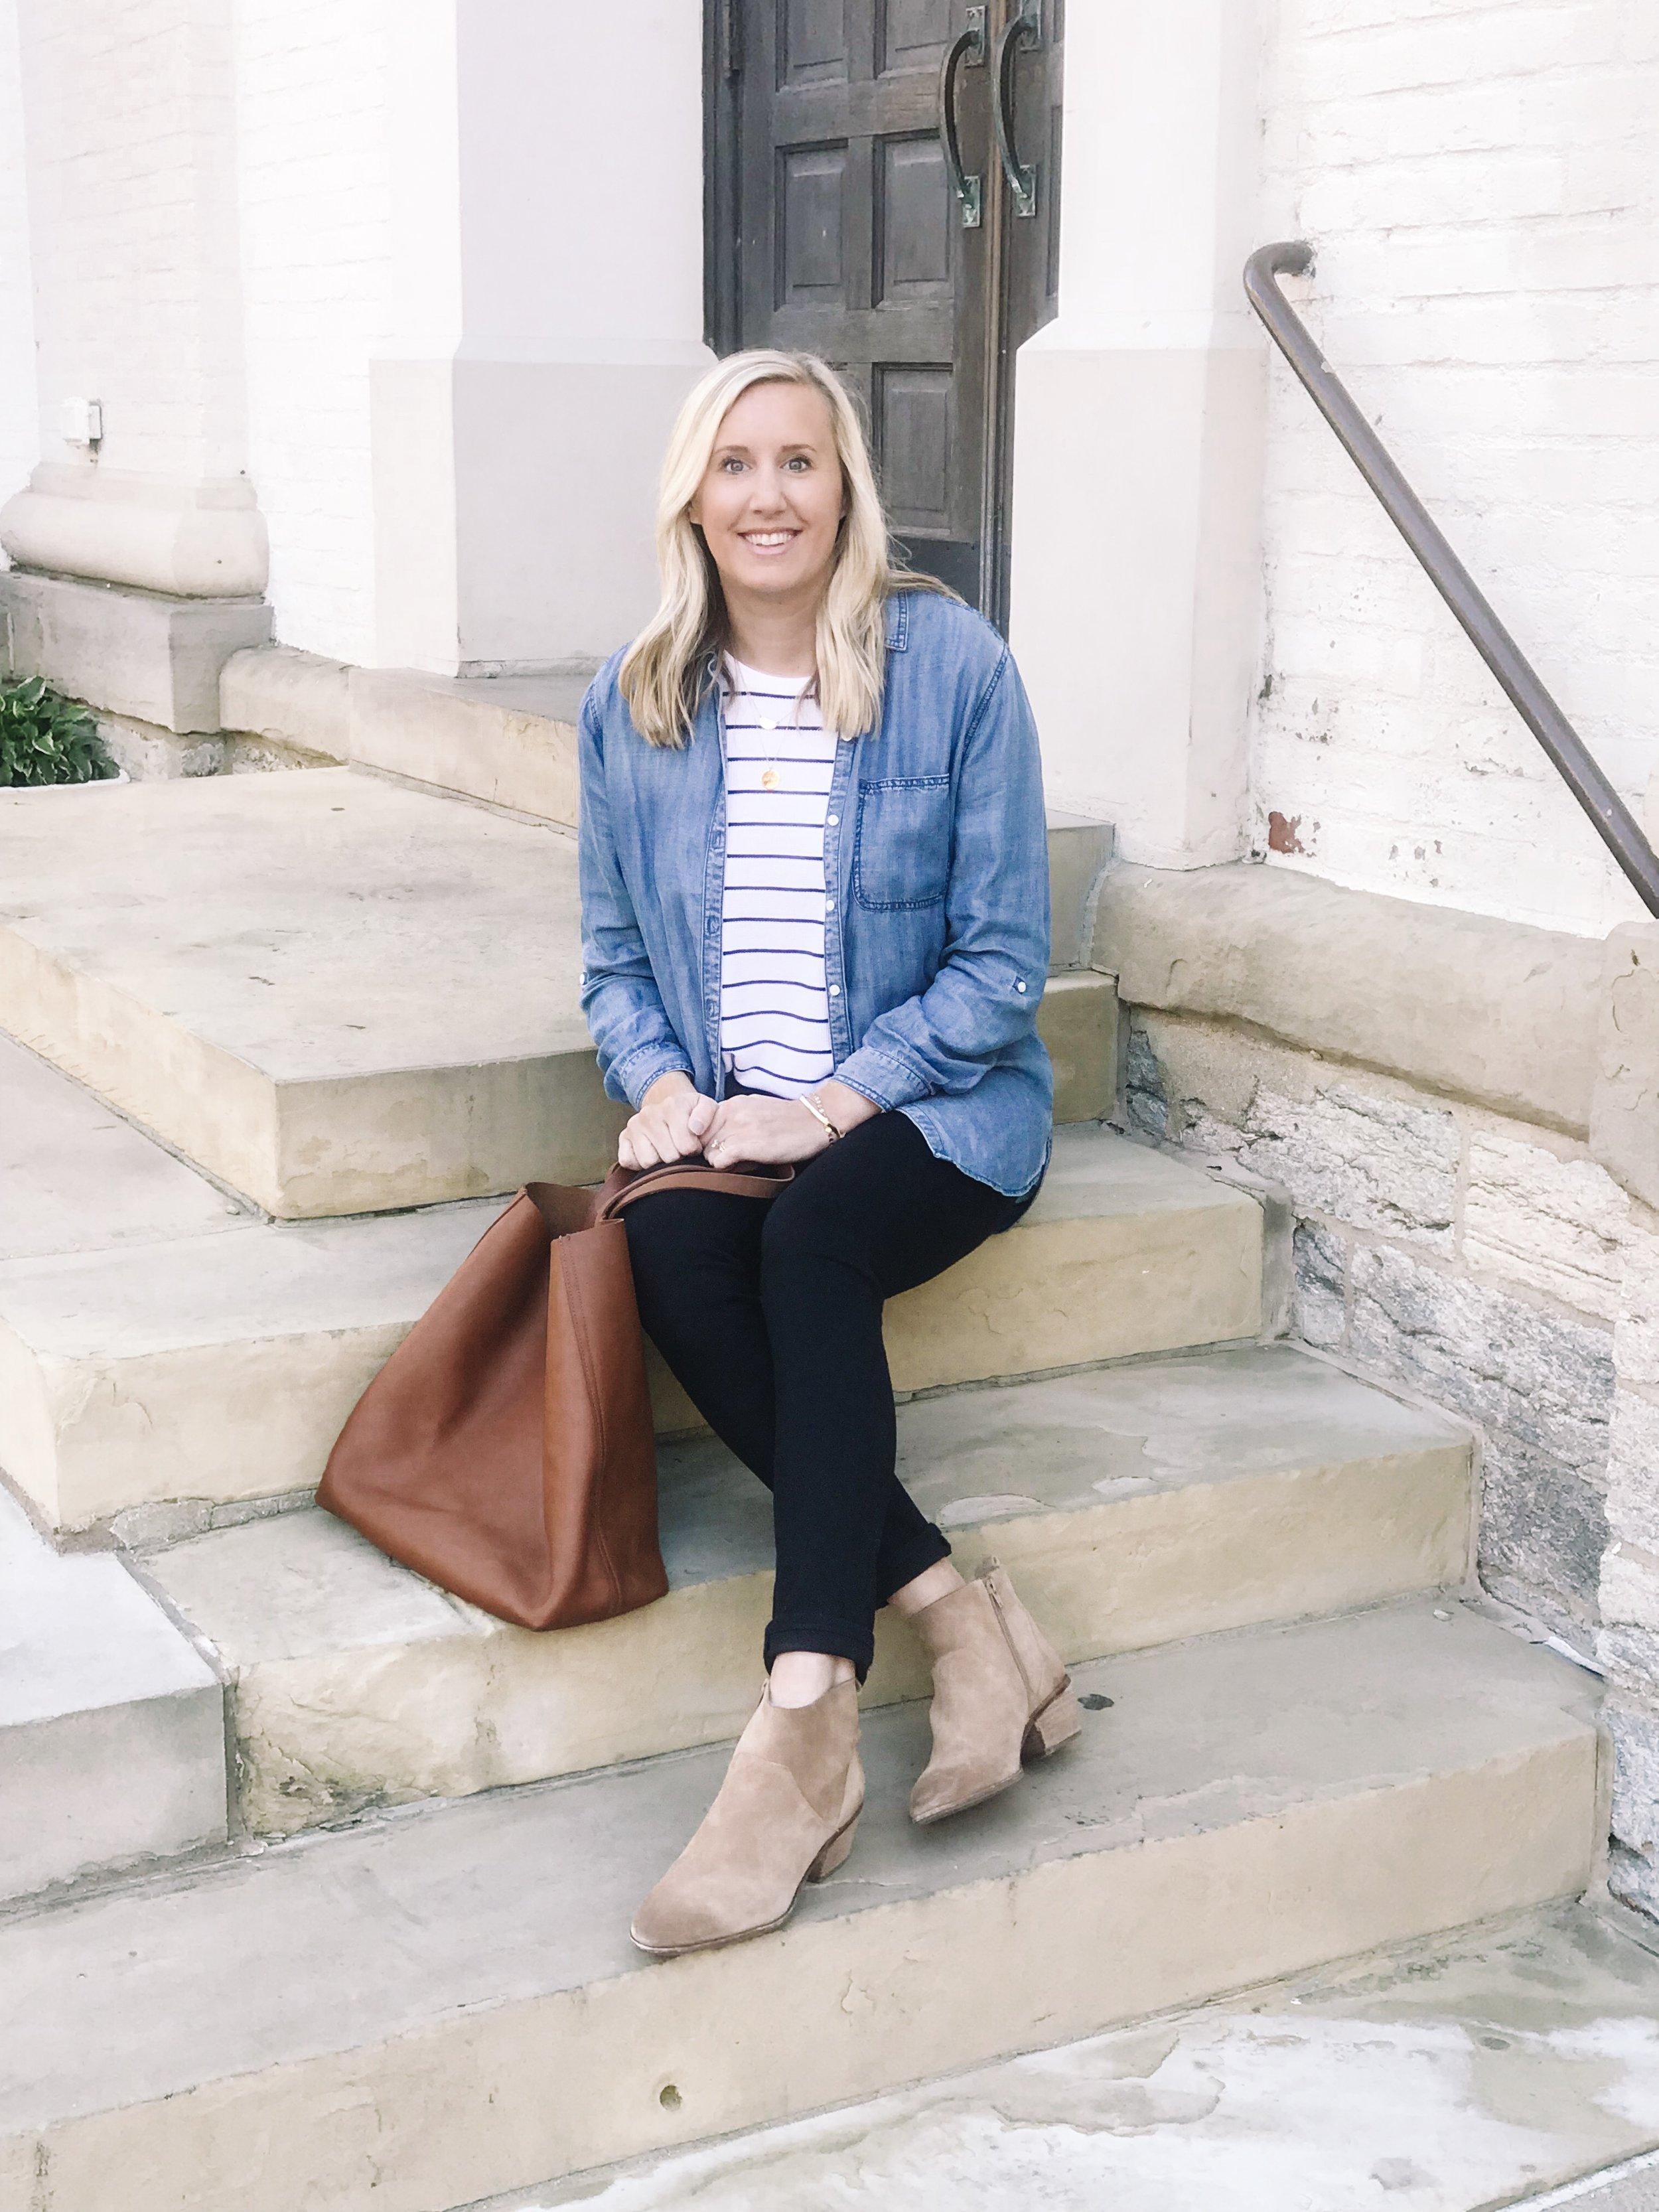 Fall Capsule Wardrobe — 15 Basics You Need in Your Closet